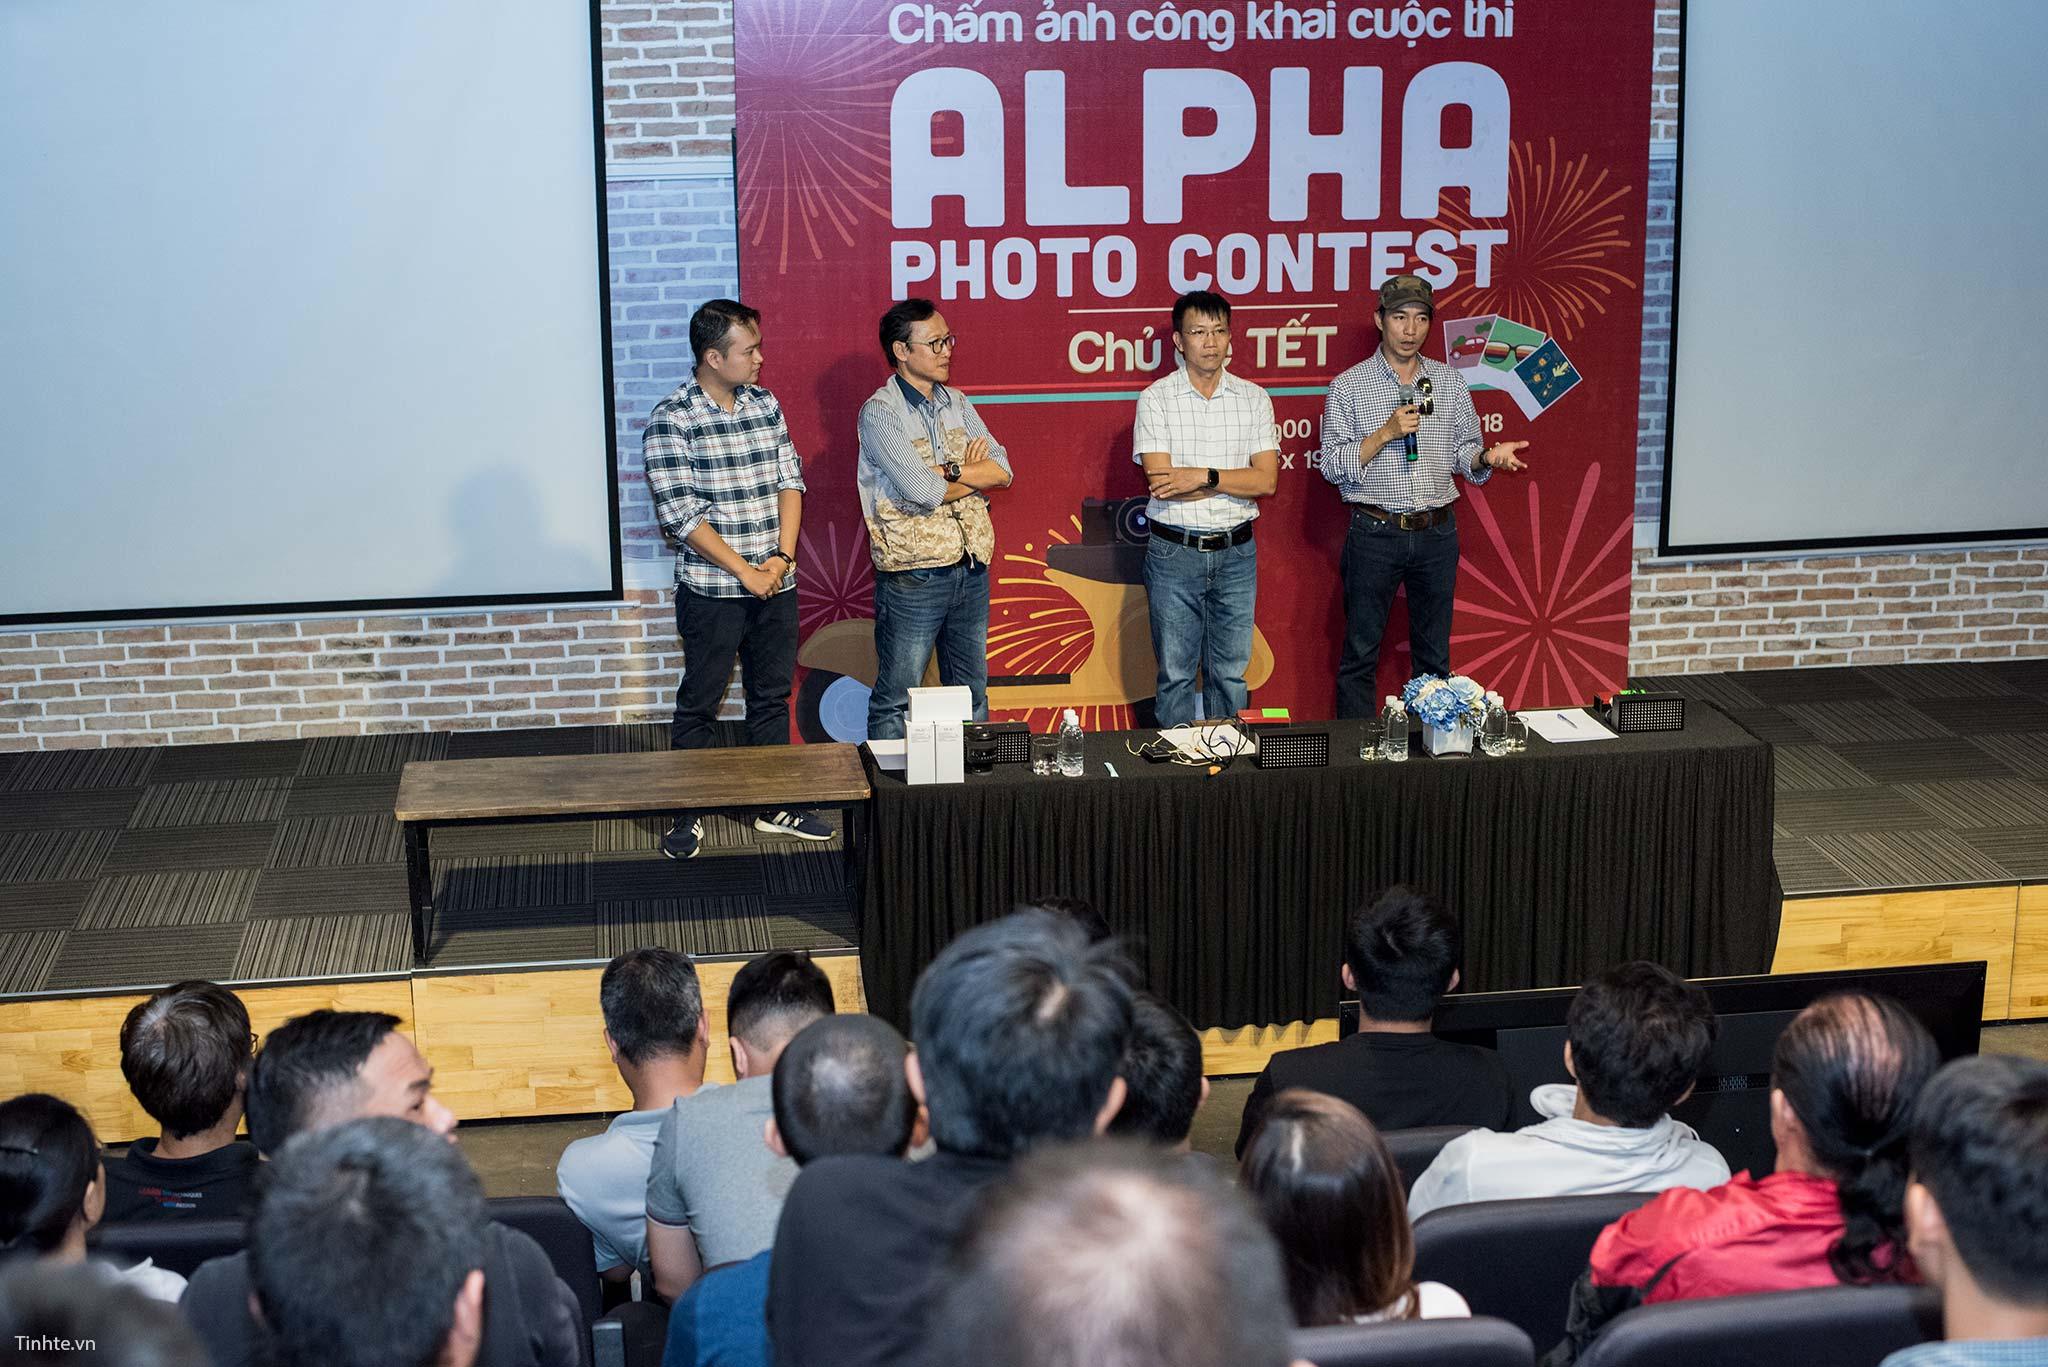 alphaphotocontest-camera.tinhte.vn-33.jpg